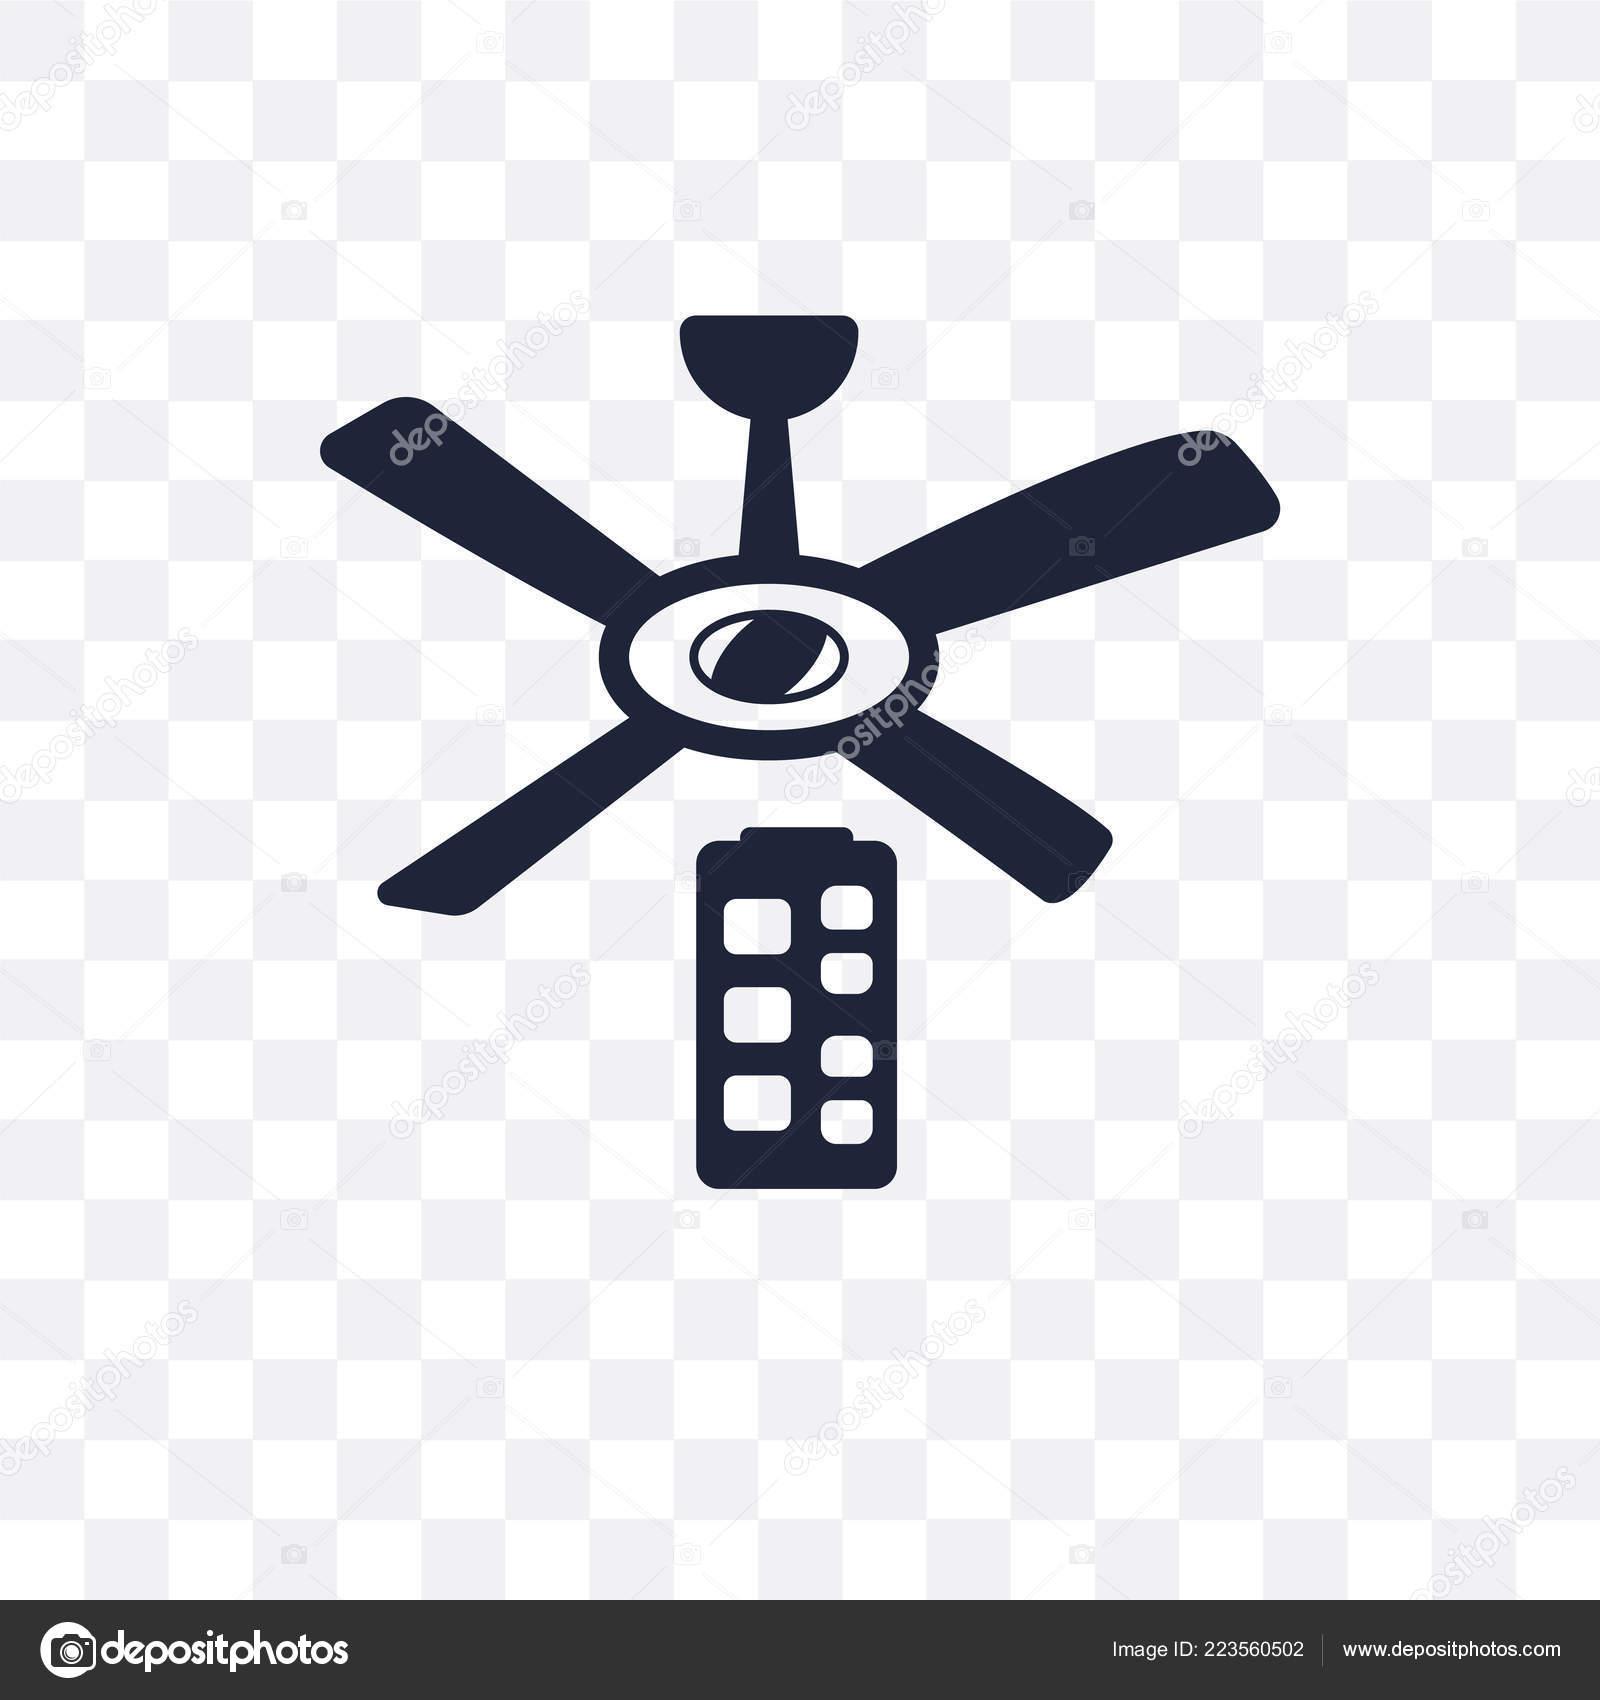 Ceiling Fan Symbol Ceiling Fan Transparent Icon Ceiling Fan Symbol Design Electronic Devices Stock Vector C Coolvectorstock 223560502